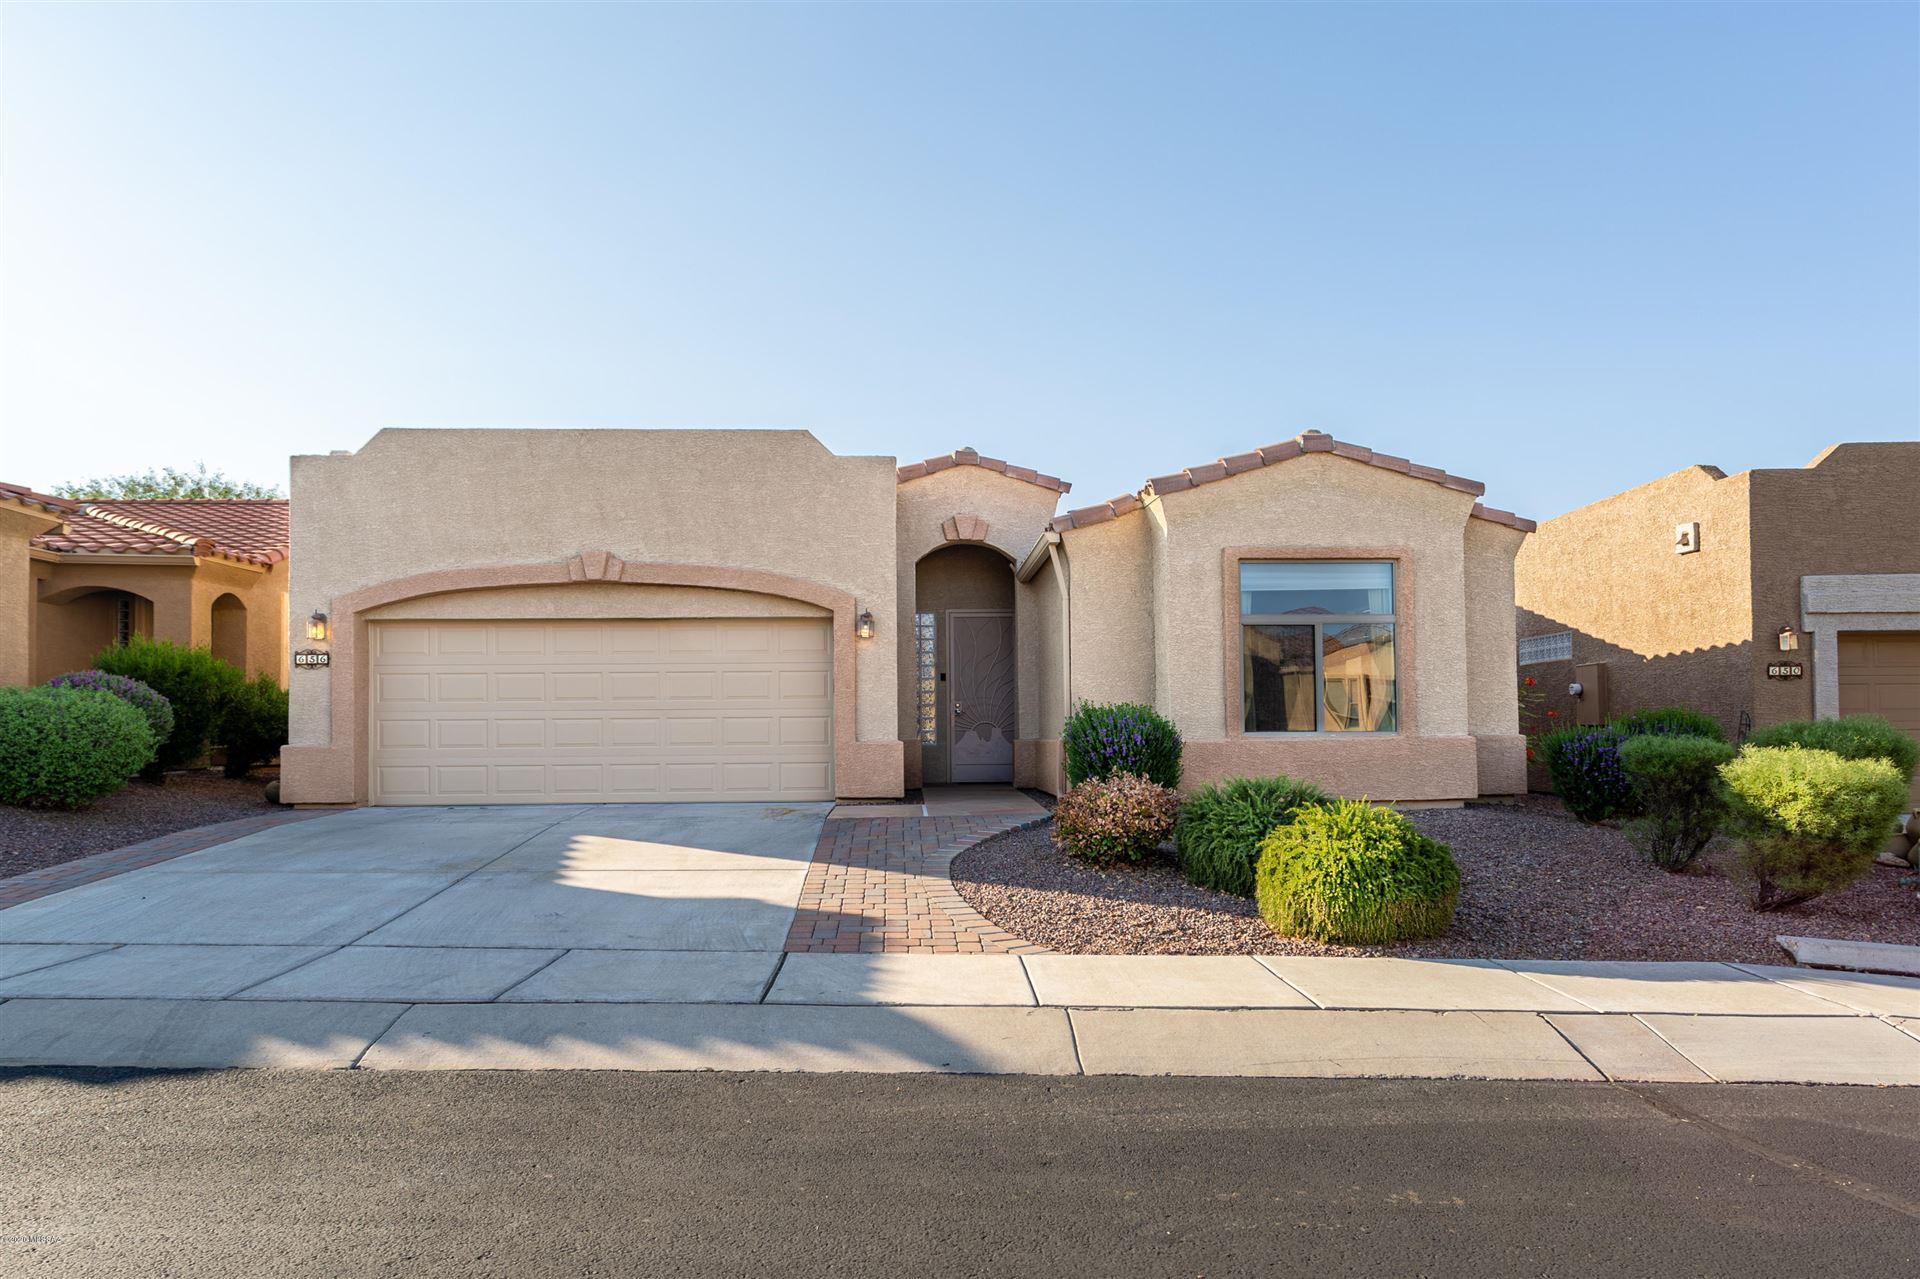 656 W Shadow Wood Street, Green Valley, AZ 85614 - #: 22022142